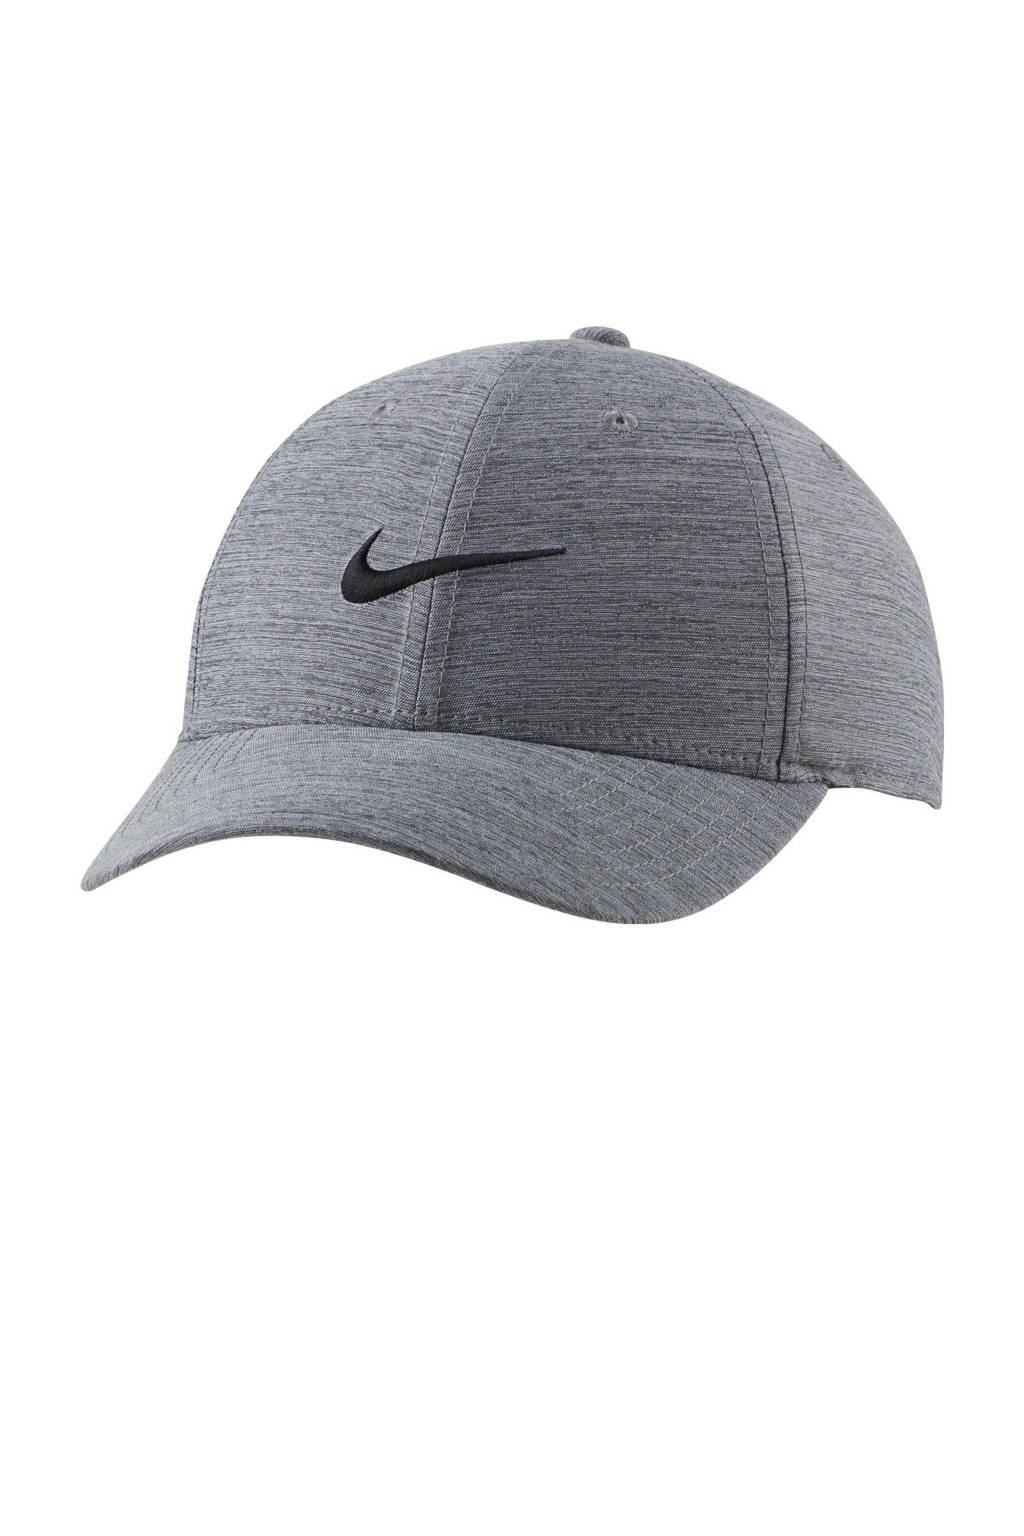 Nike pet grijs/zwart, Grijs/zwart